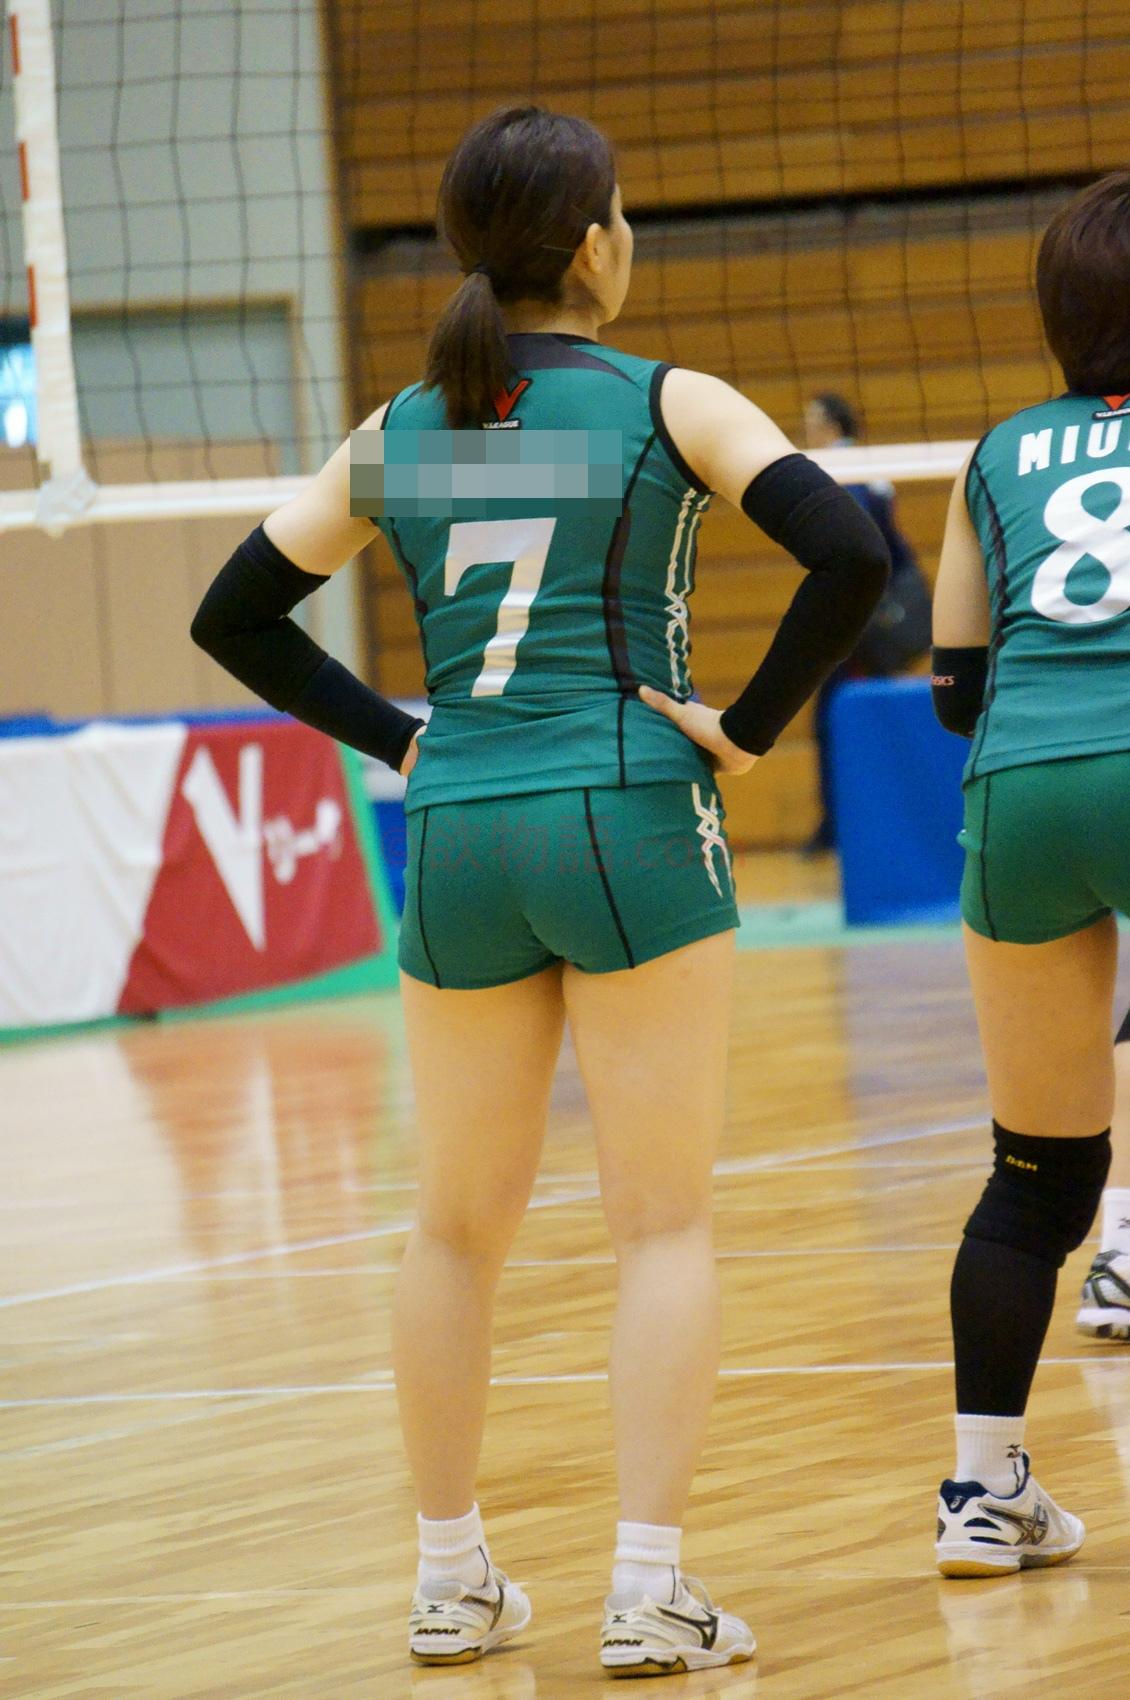 ≪女子バレー≫KUROBE対GSS 3(選手入場時の和気藹々)